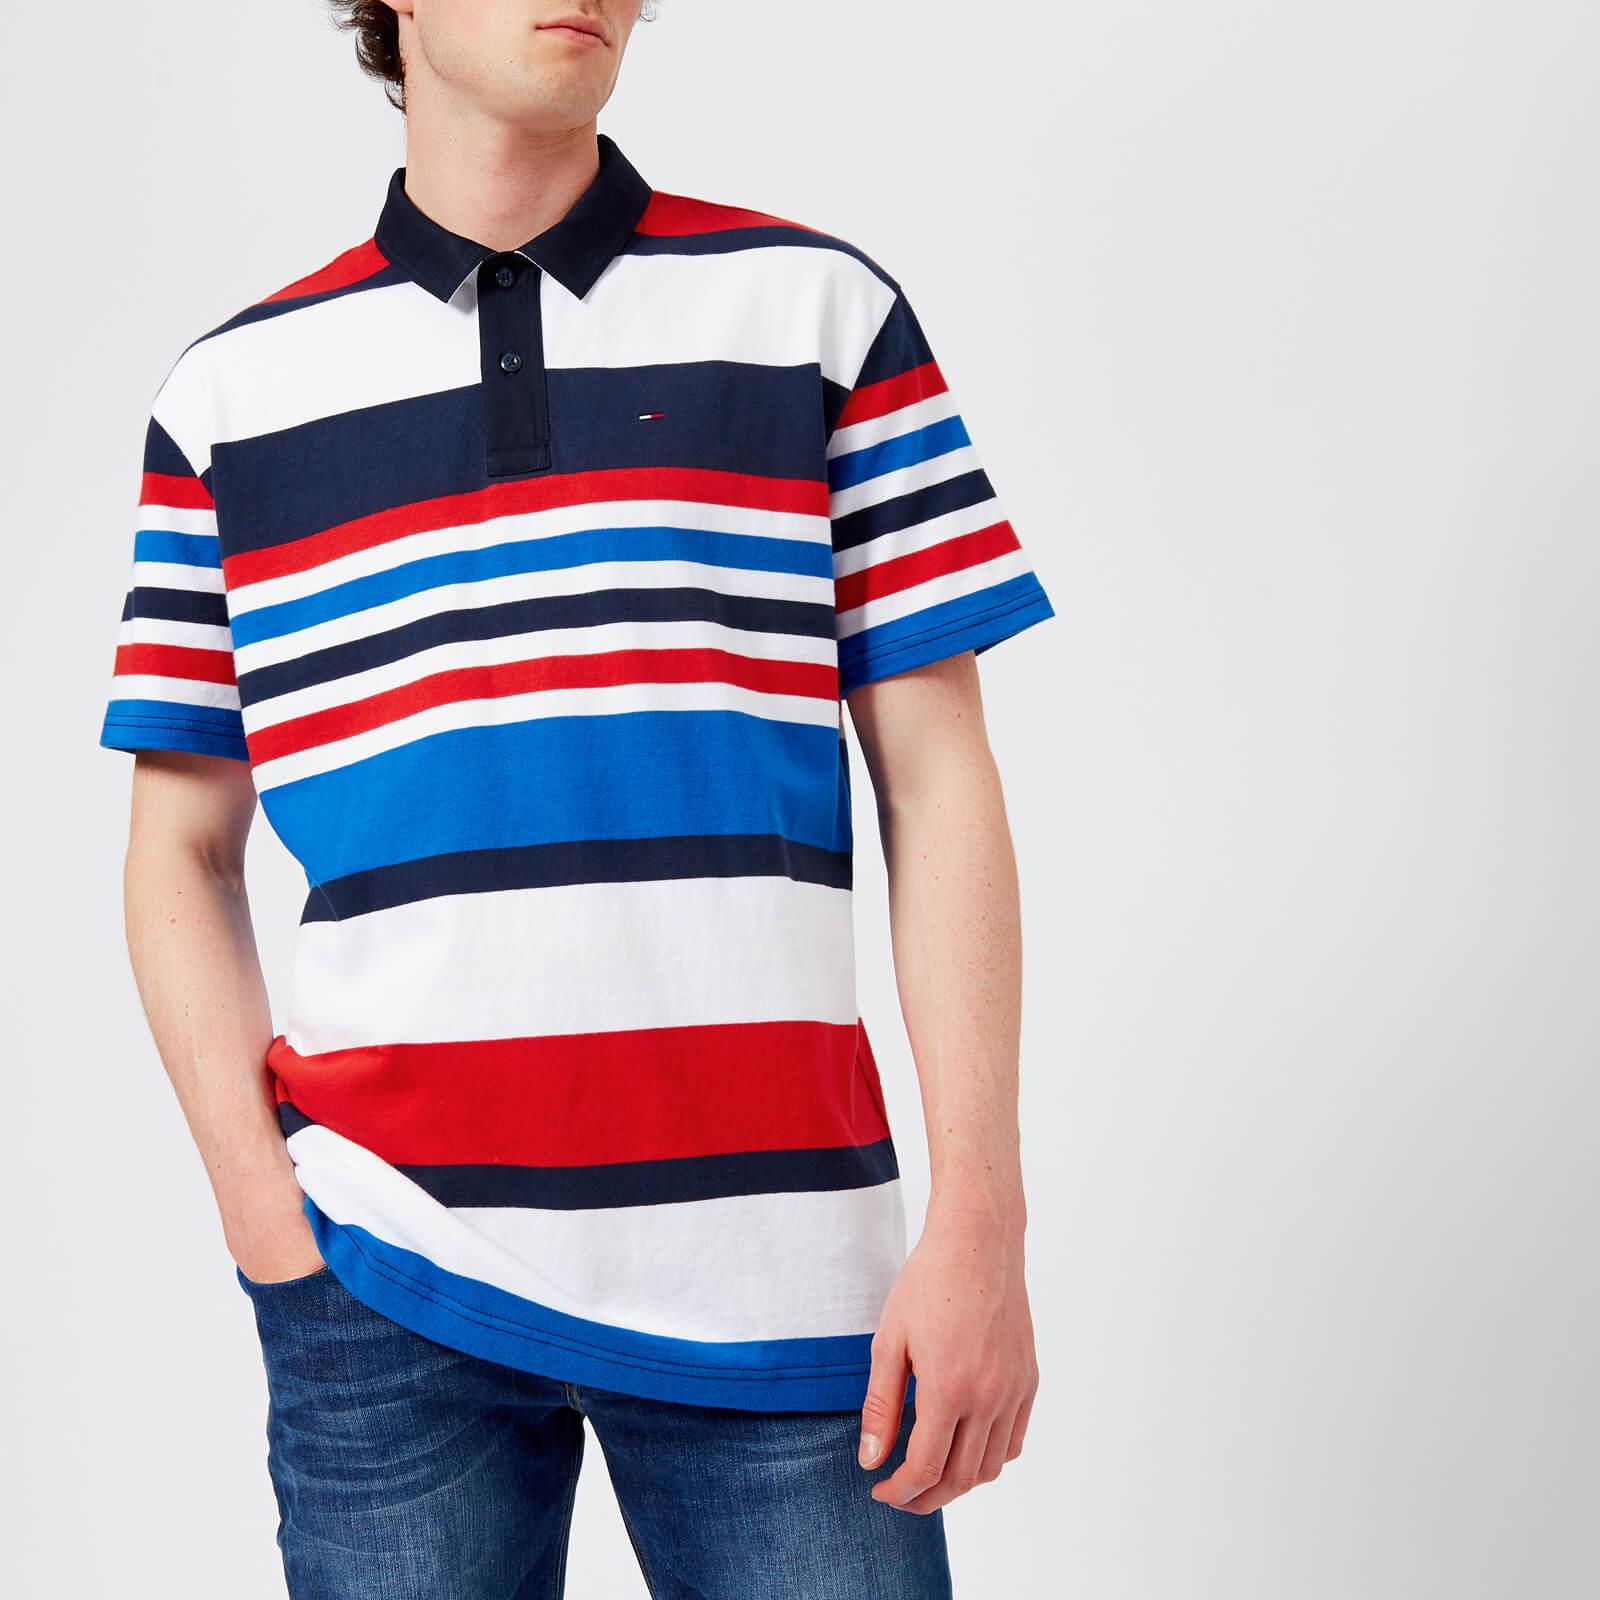 8316003e Tommy Jeans Men's Stripe Polo Shirt - Black Iris/Multi - Free UK Delivery  over £50